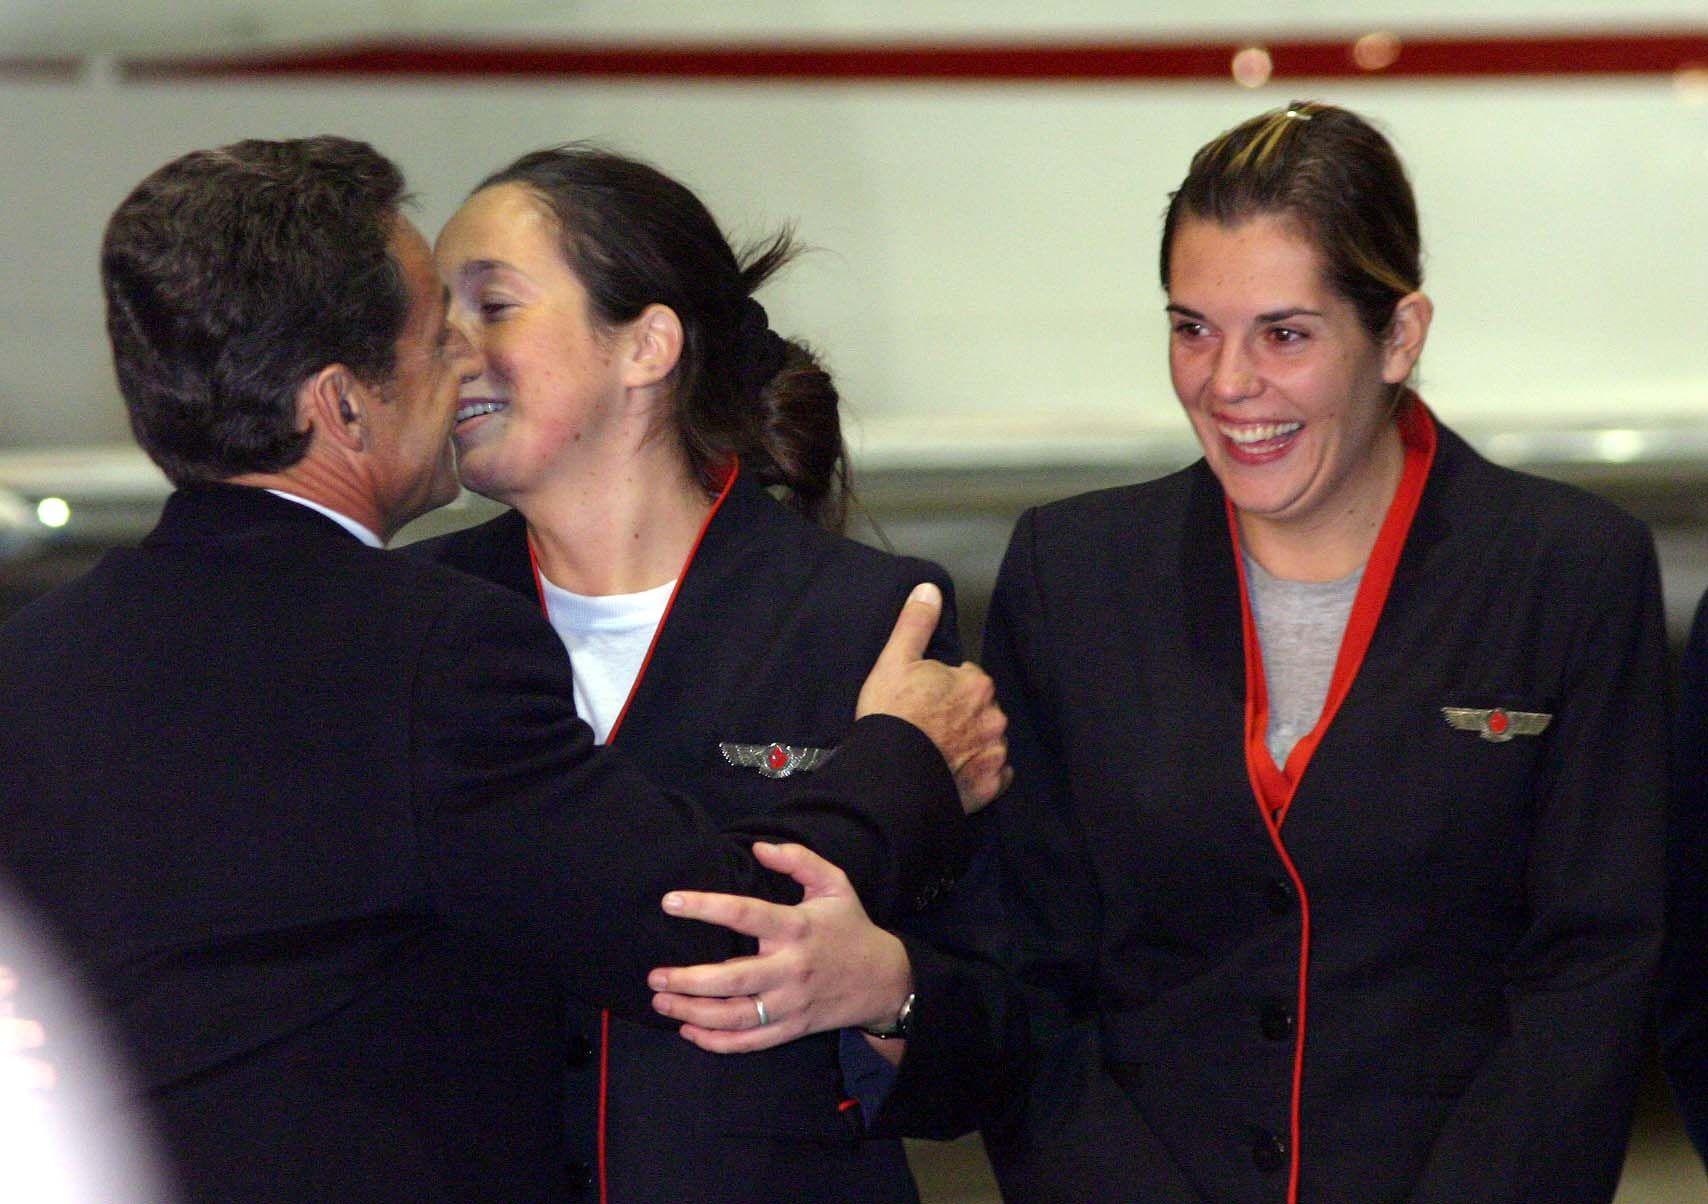 Tatiana saludada por Nicol�s Sarkozy.jpg